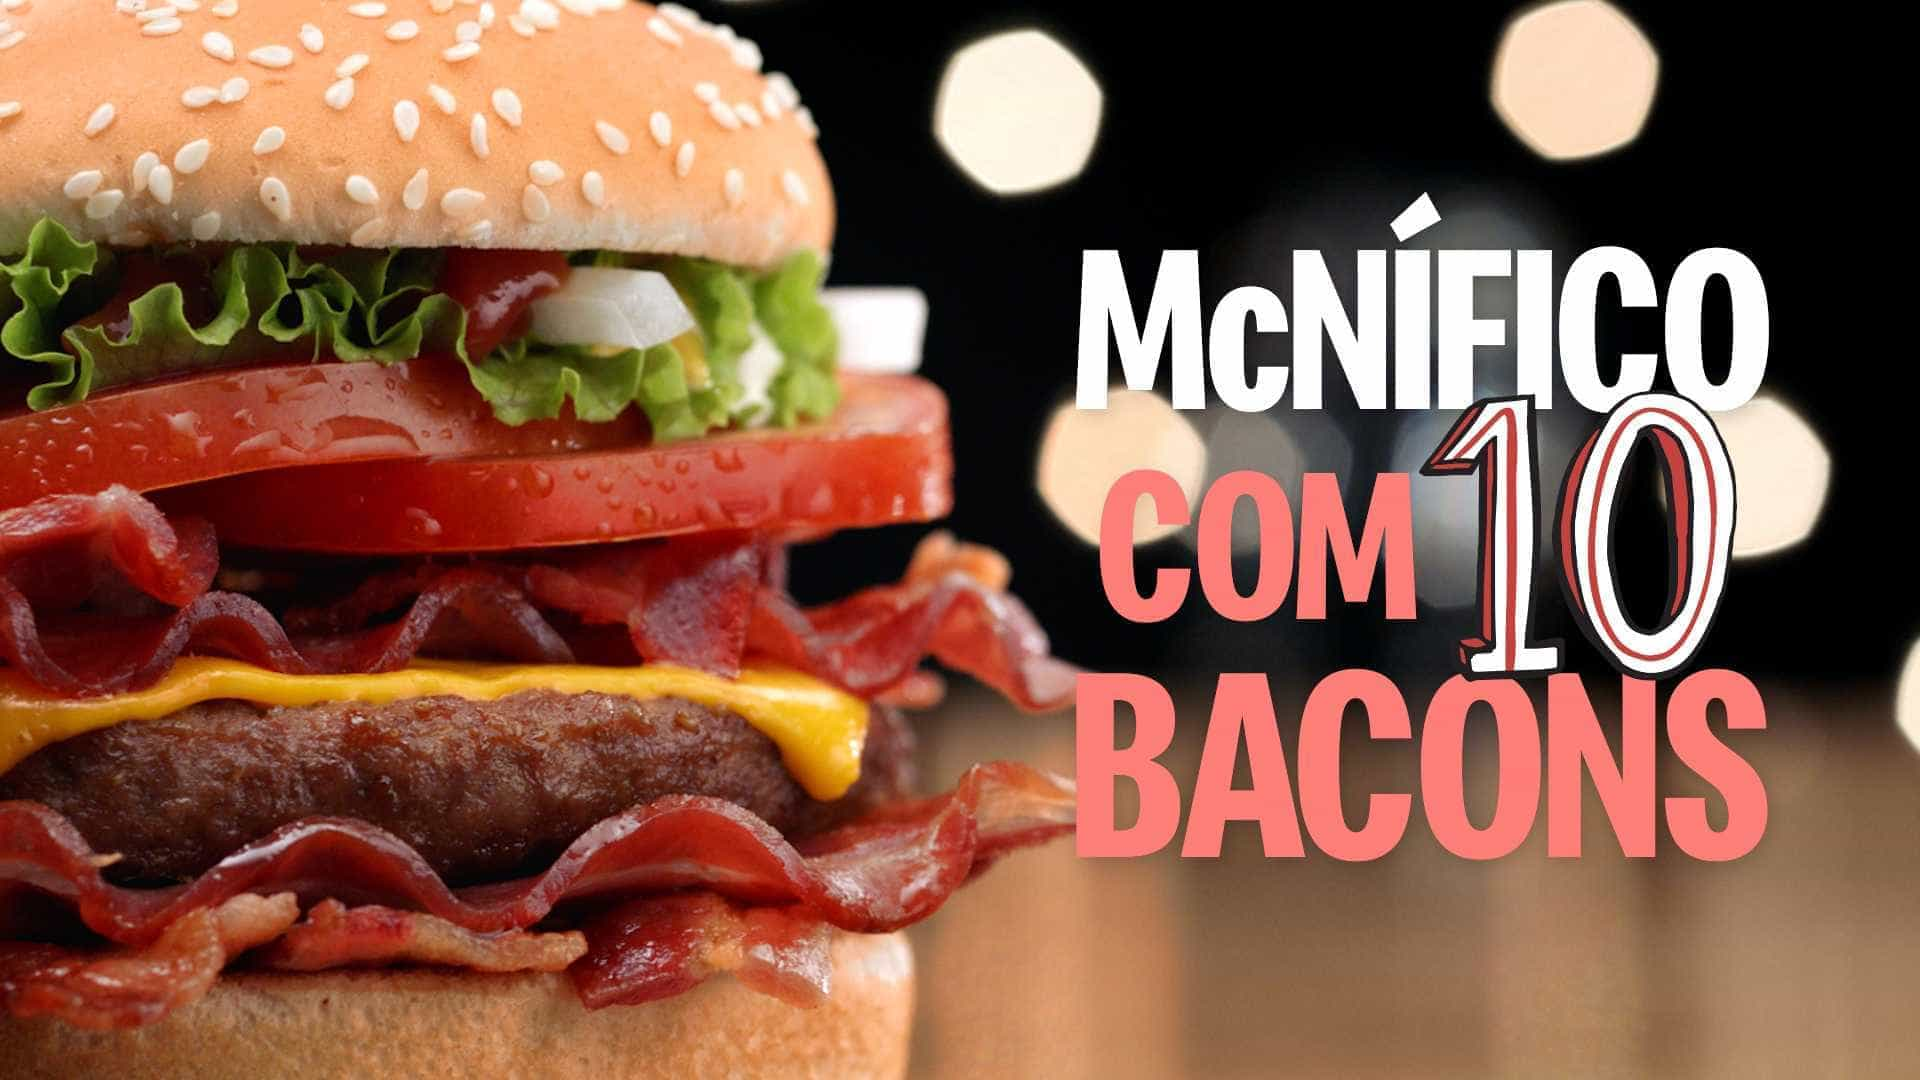 Redes de fast-food travam guerra do mega-hambúrguer